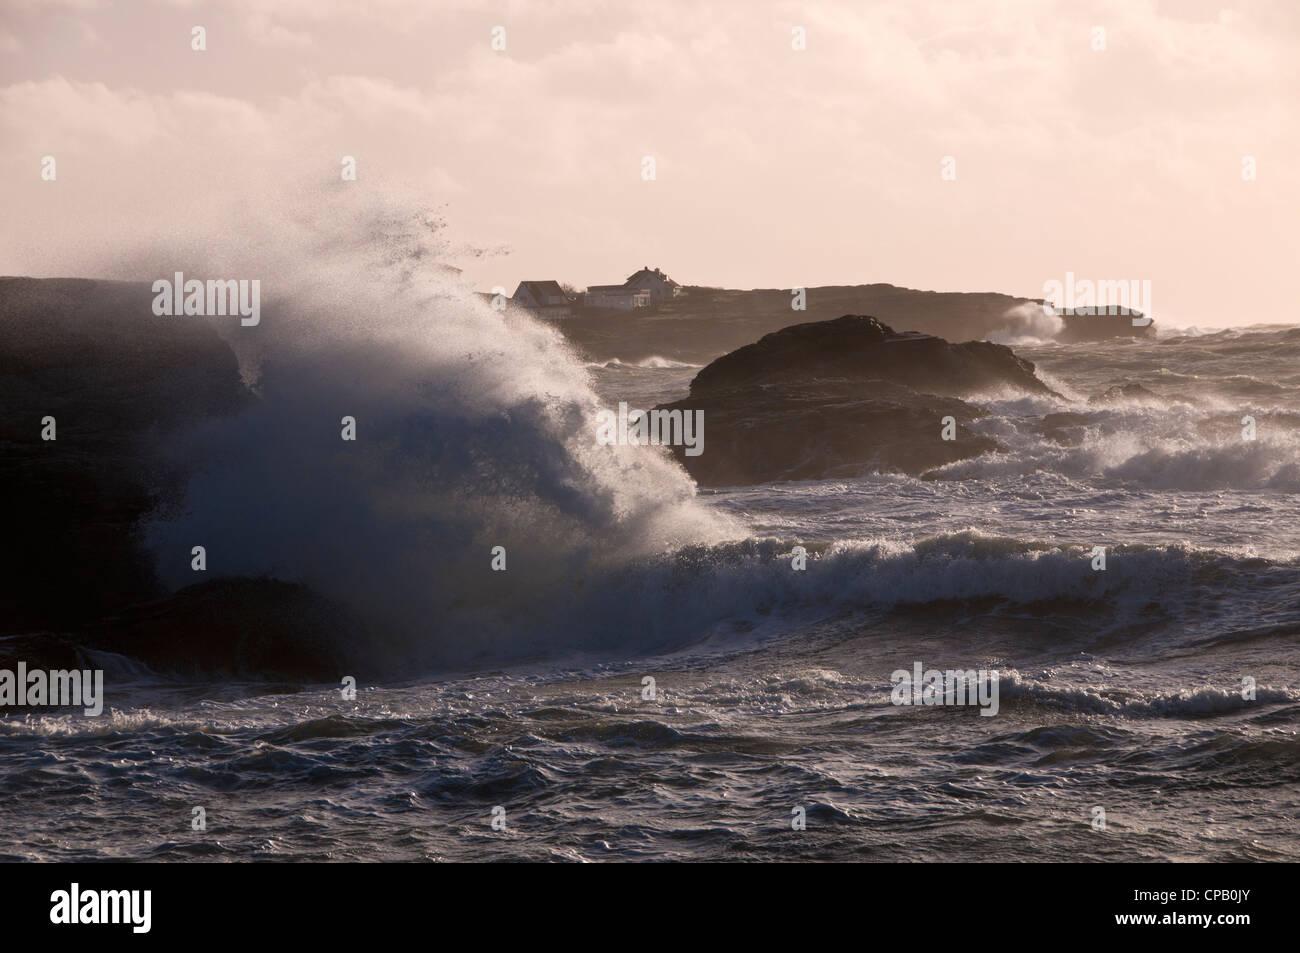 Trearddur Bay Anglesey North Wales UK. - Stock Image